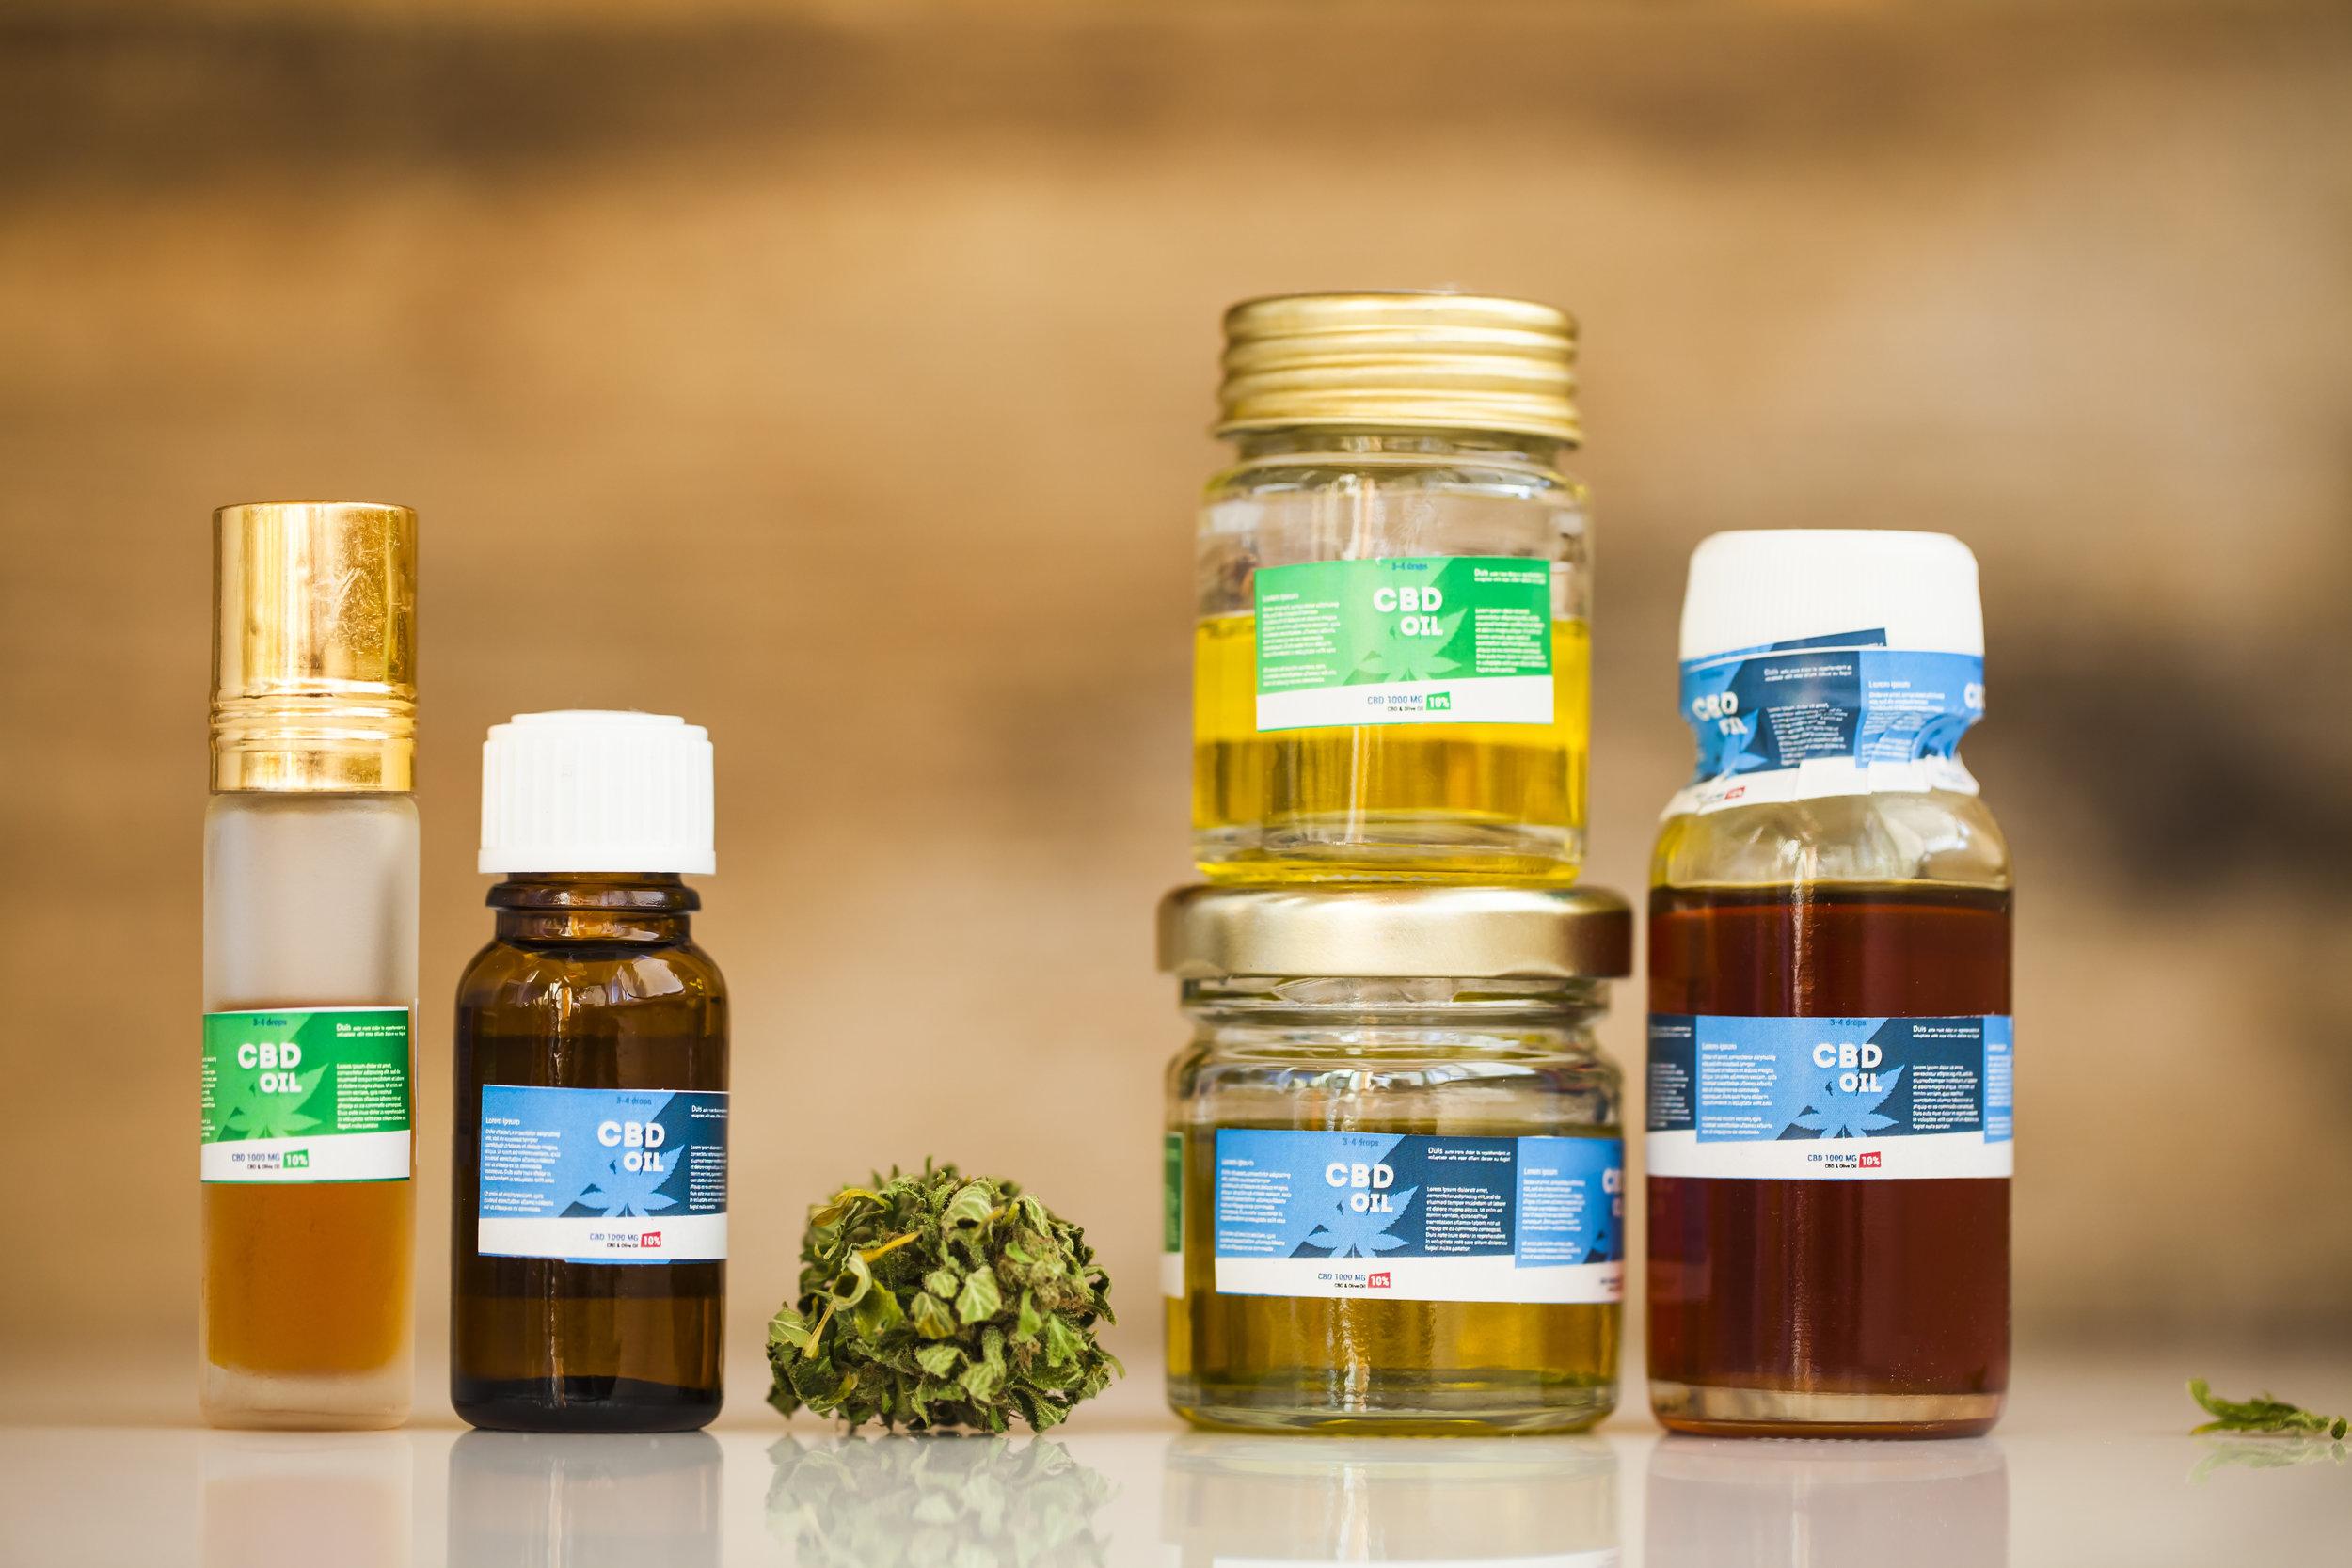 cbd based products